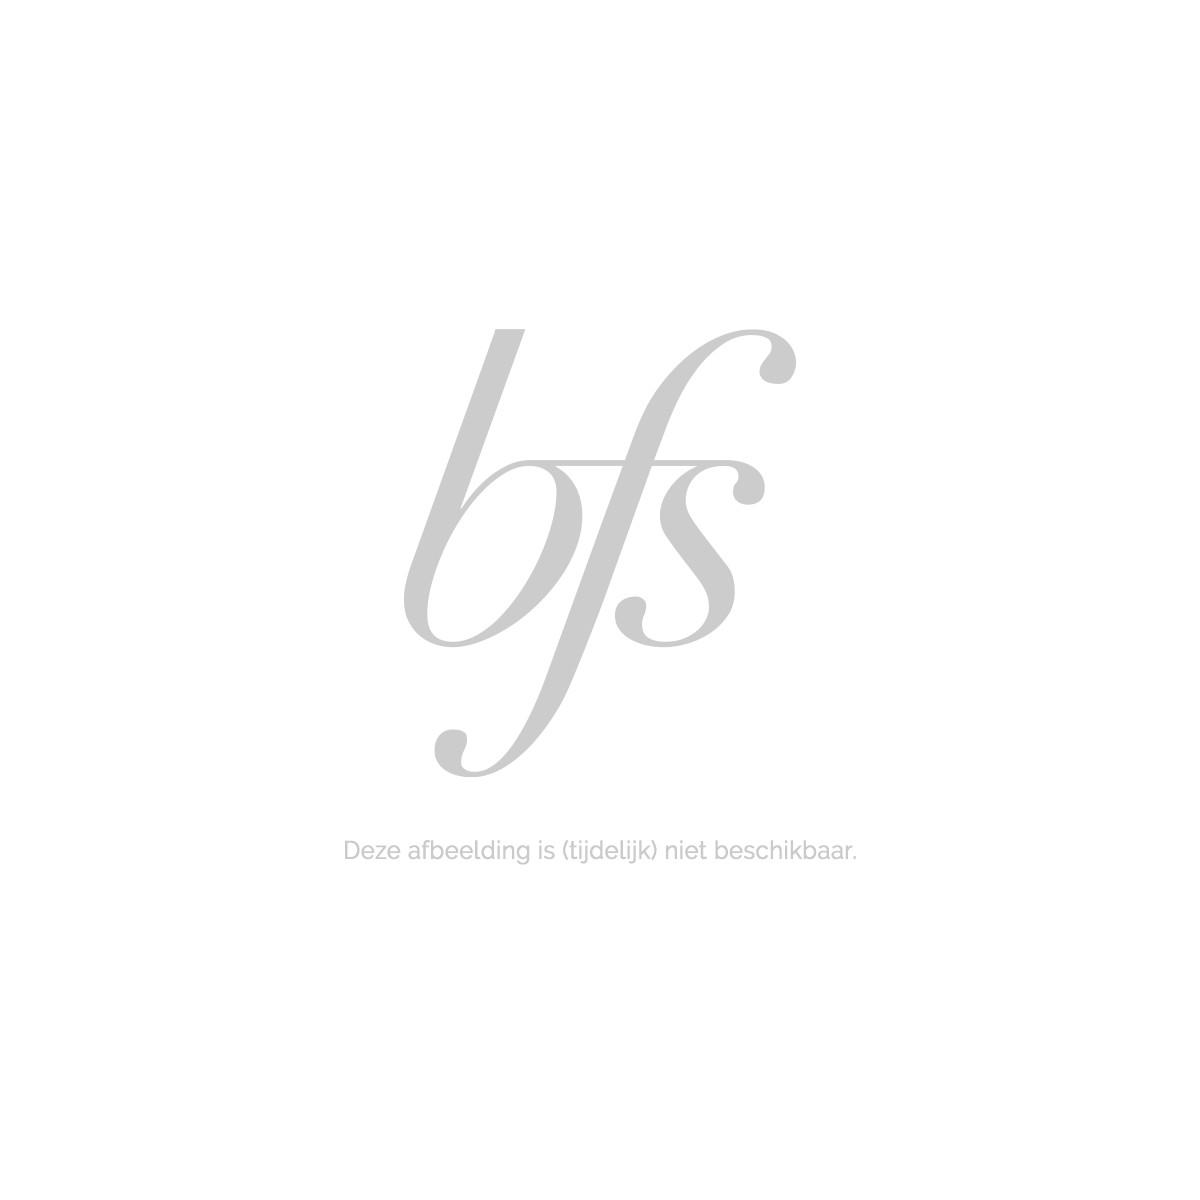 Bvlgari Omnia Crystalline Eau De Toilette Spray 40 Ml